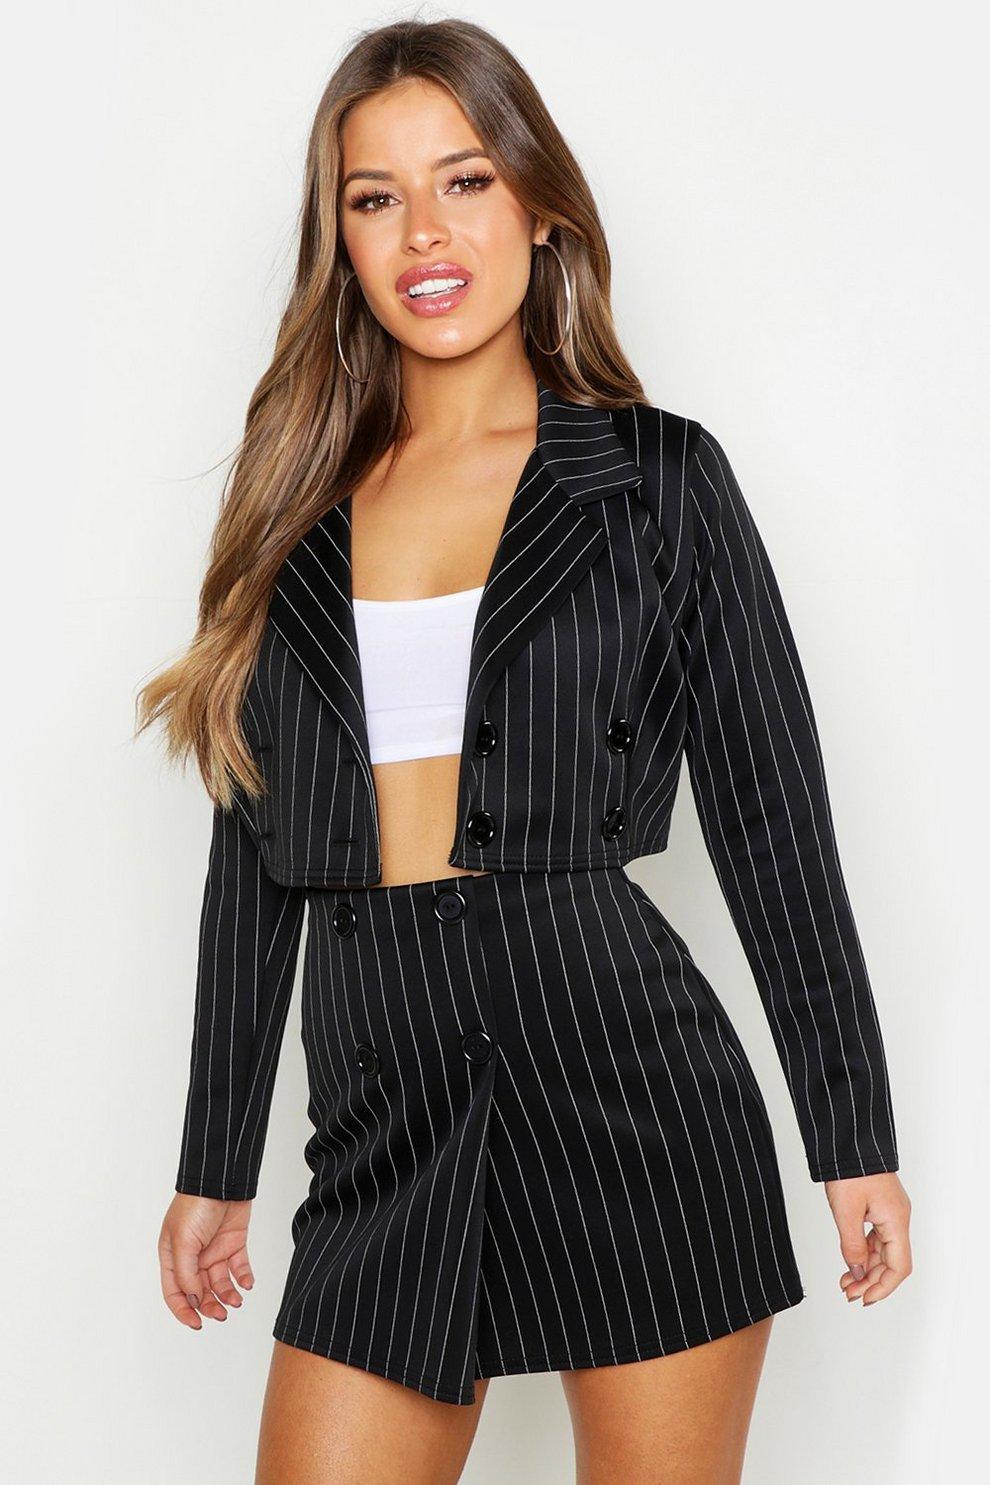 Women's Clothing Ladies Black Pinstripe Skirt Size 14